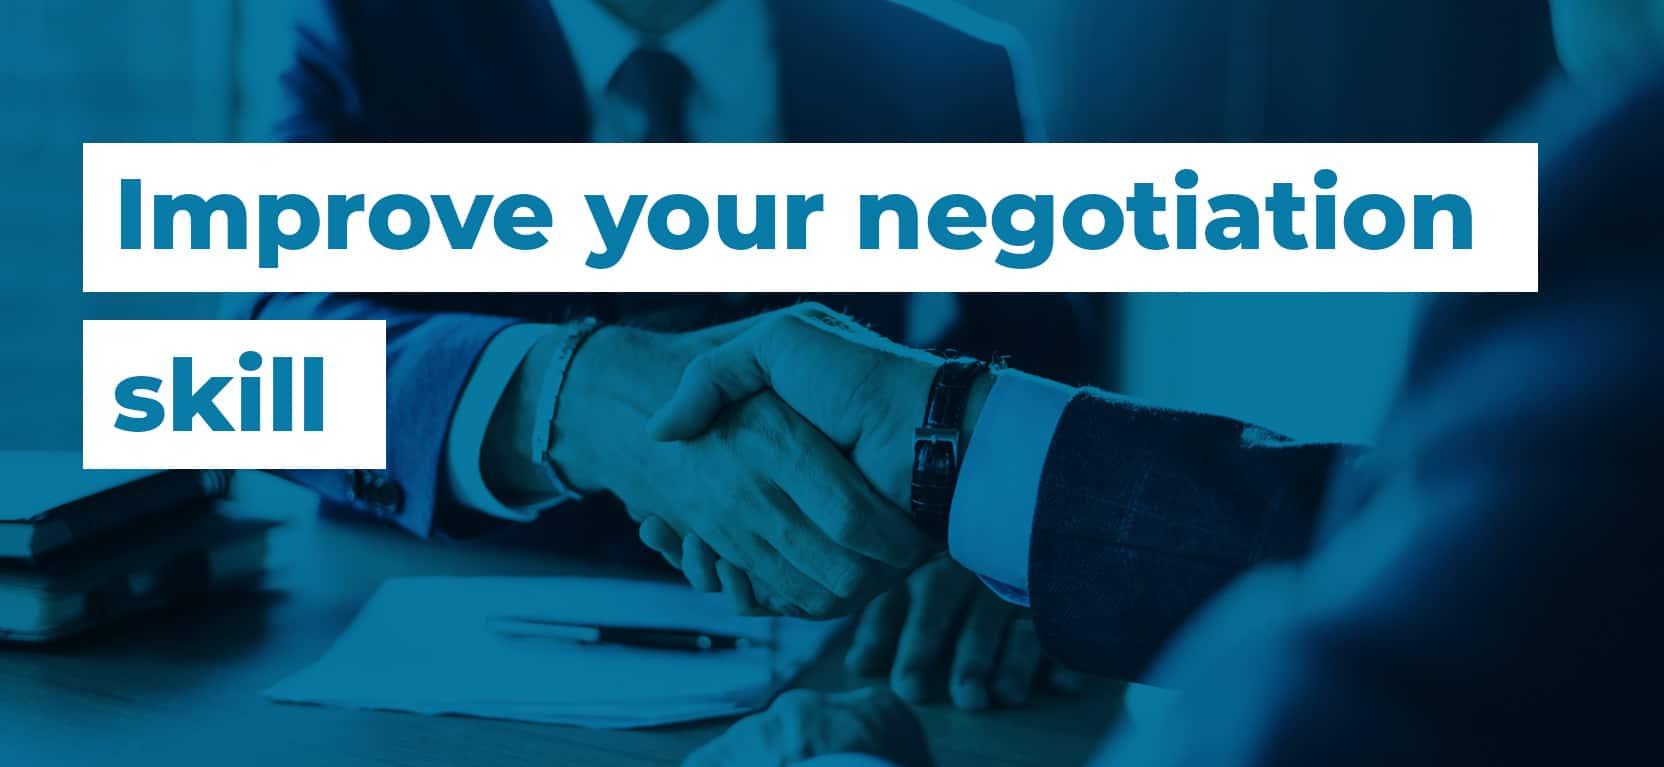 03 Improve your negotiation skill3